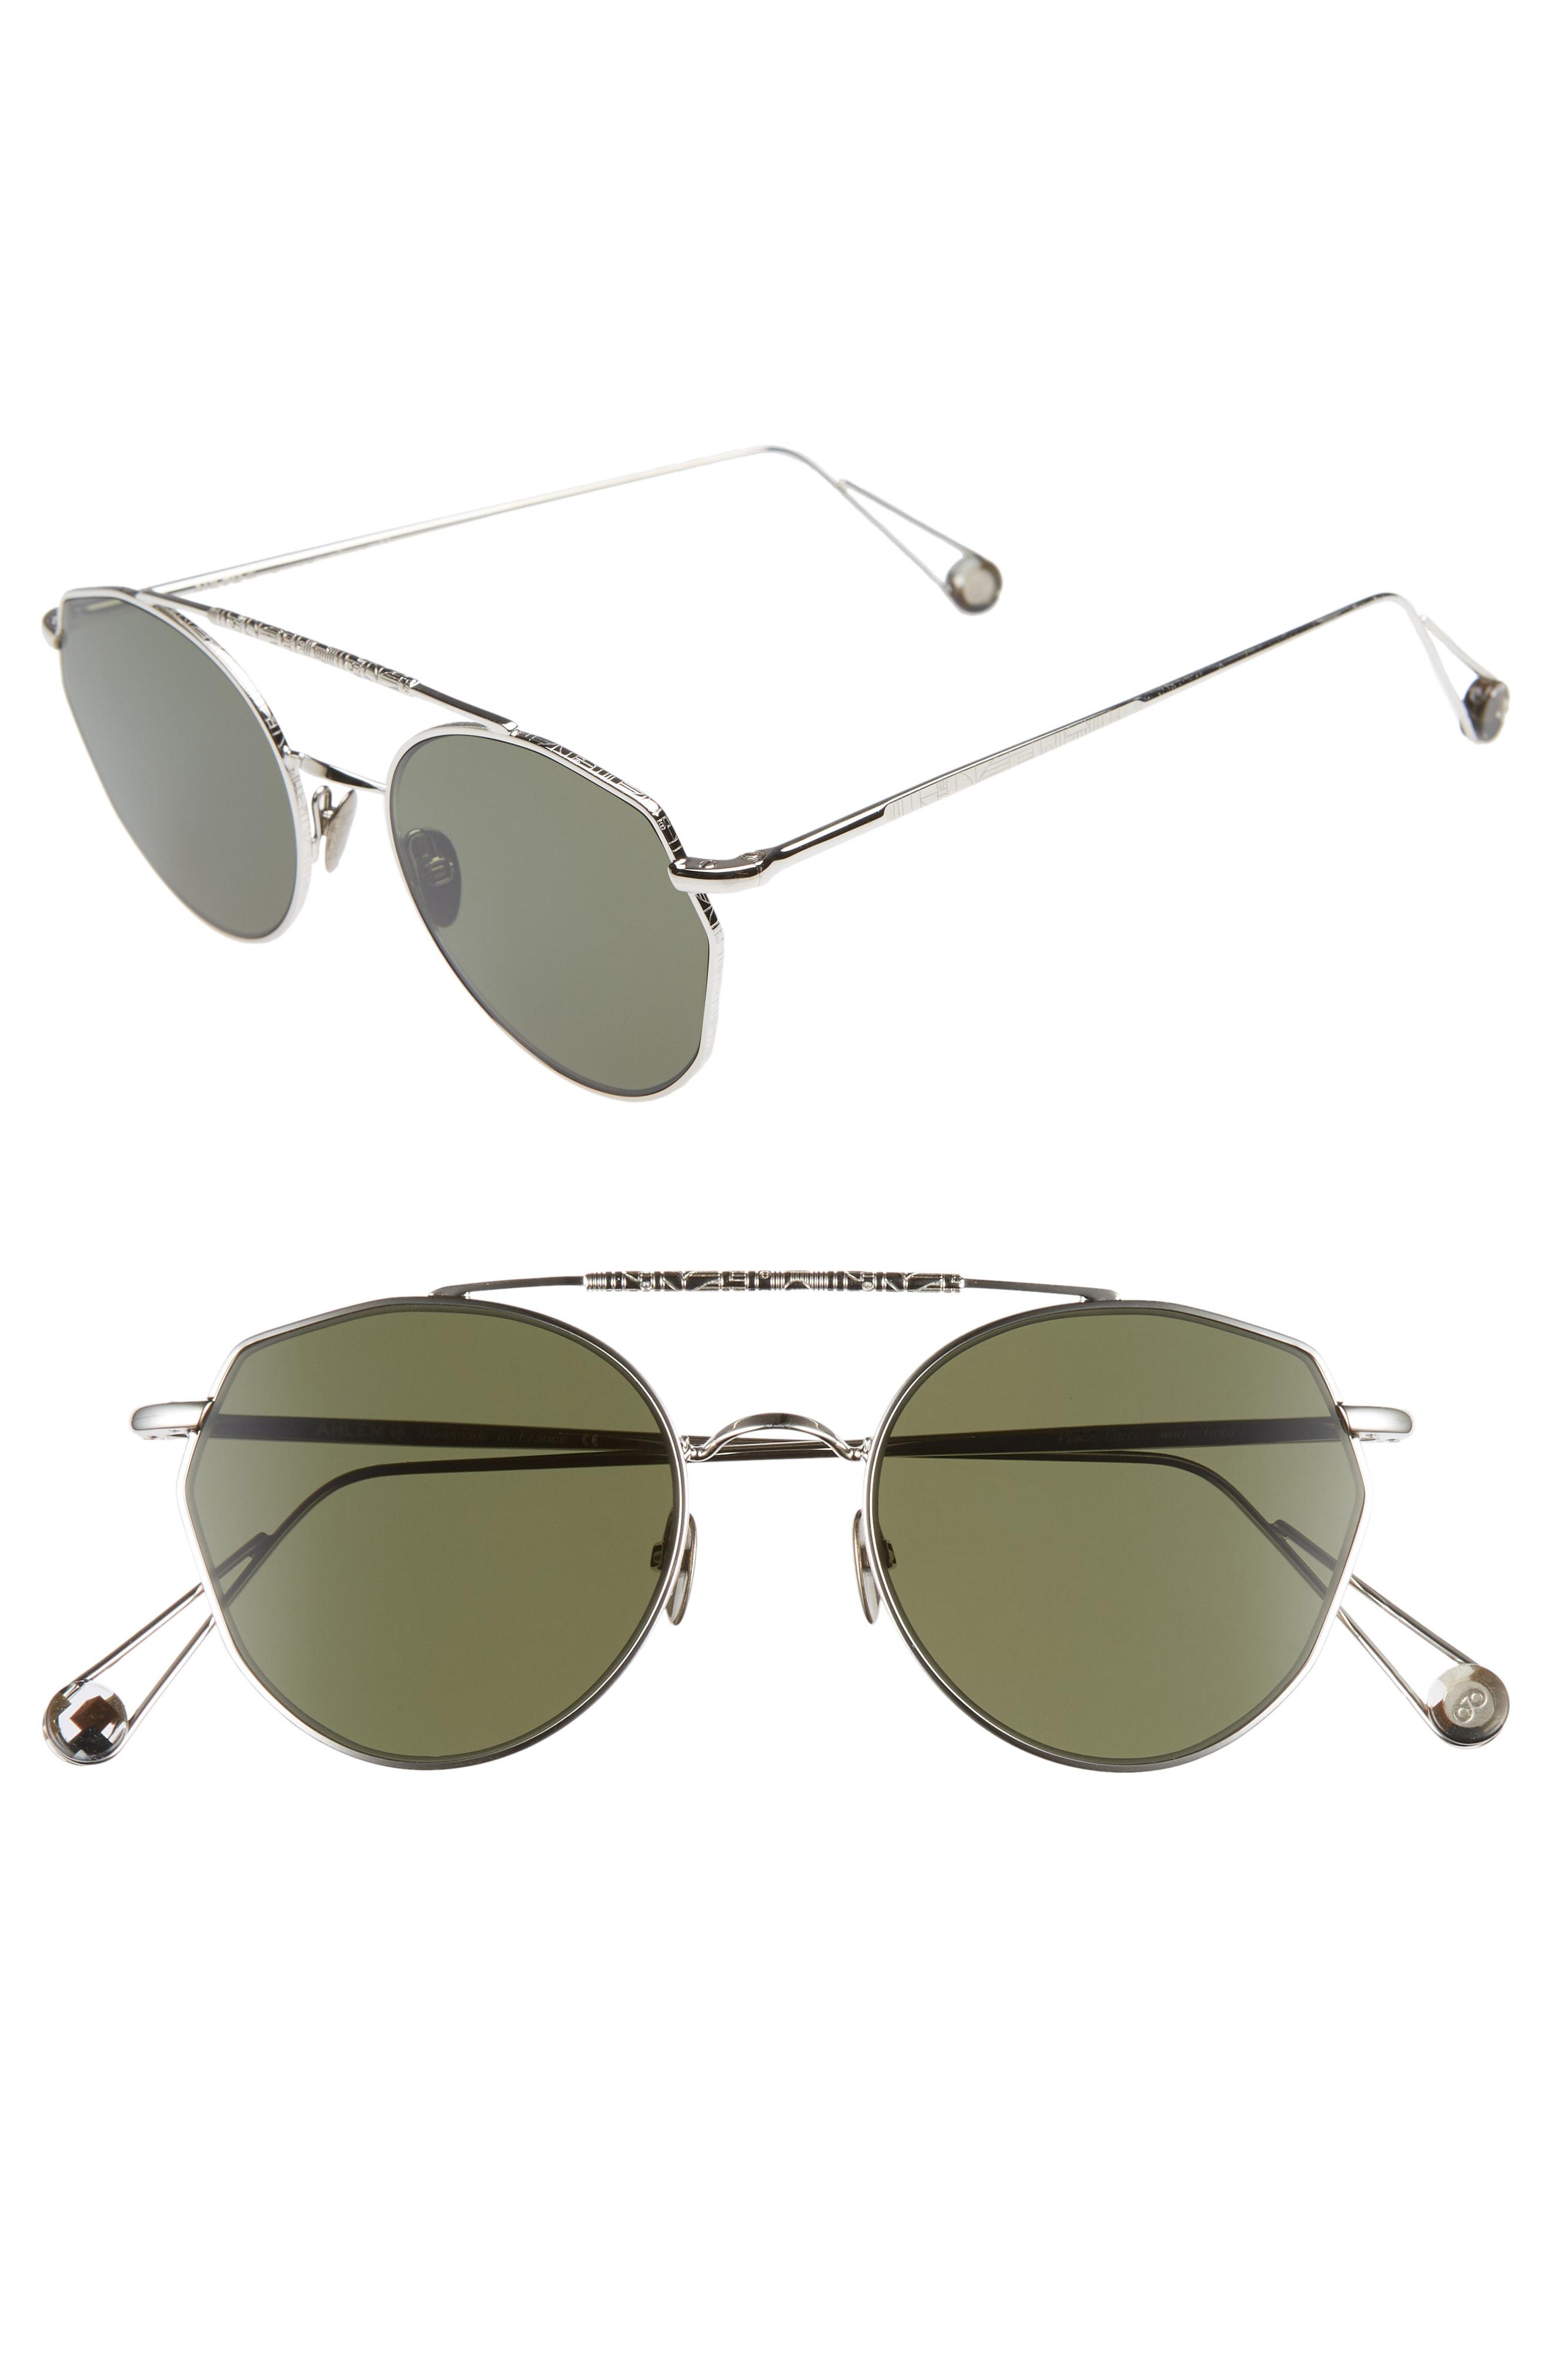 Gold Sunglasses White 51mm Aviator Carre mNv08wn